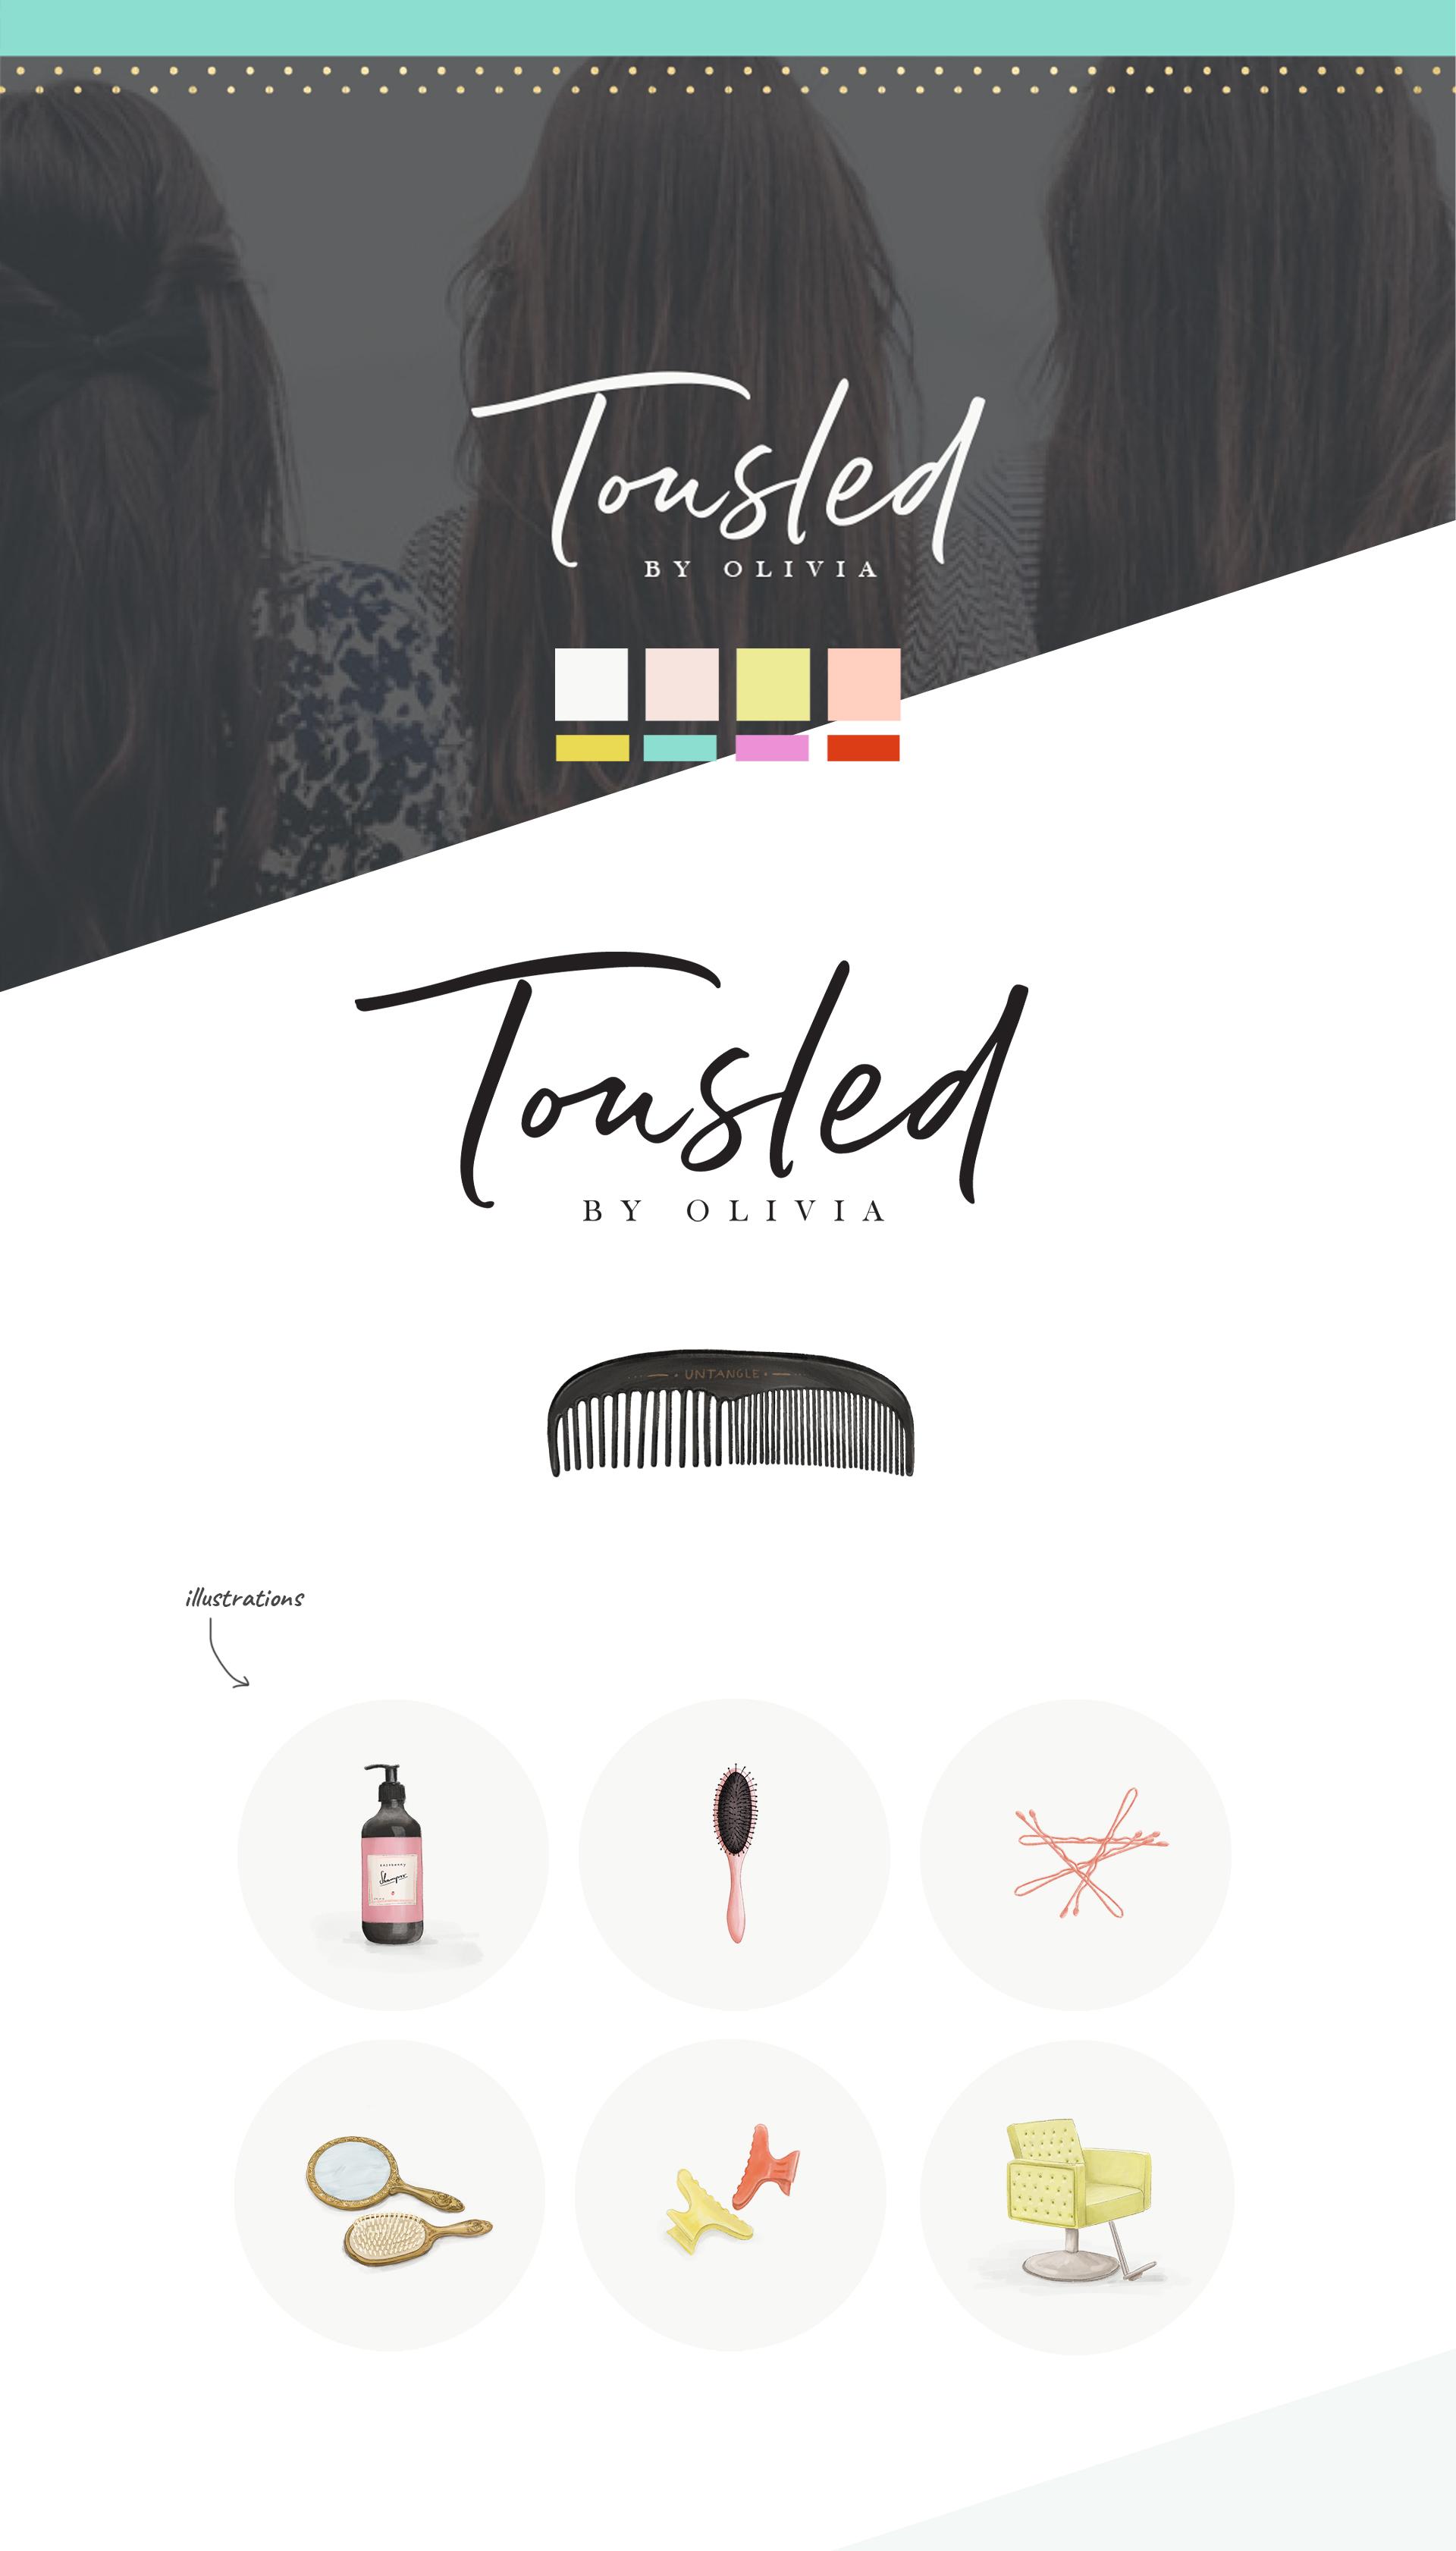 Tousled Brandboard1.jpg